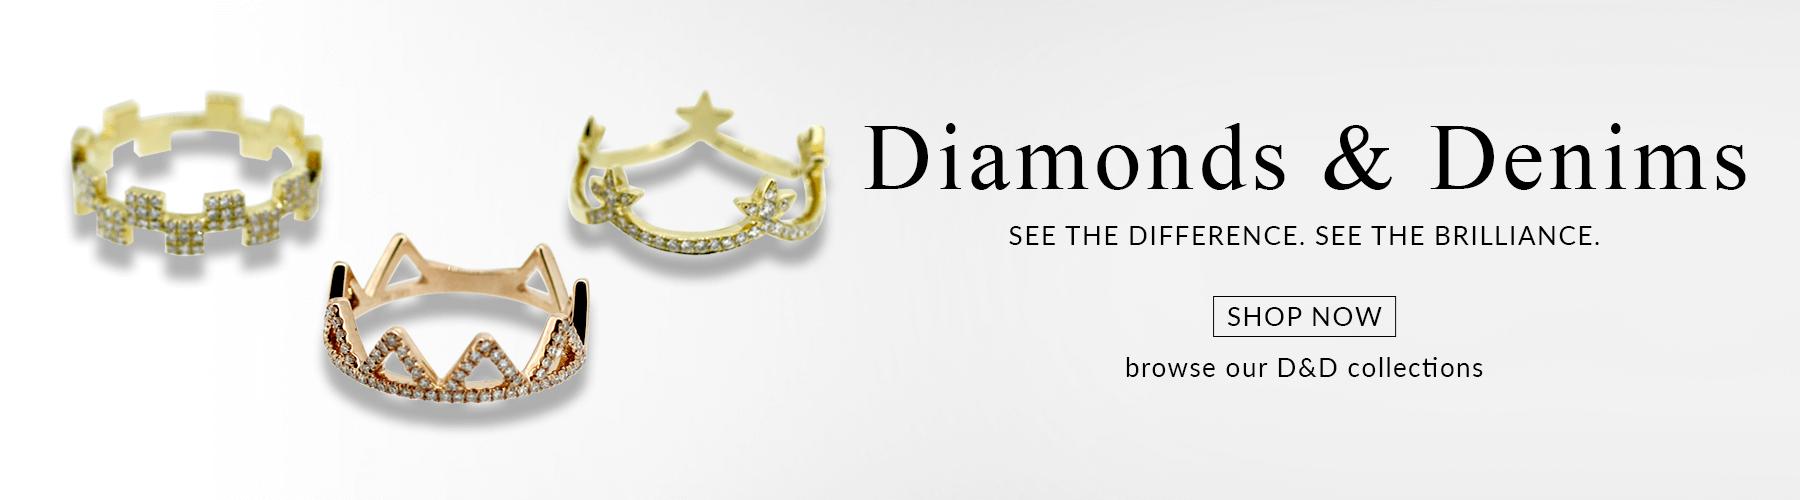 Diamonds & Denims